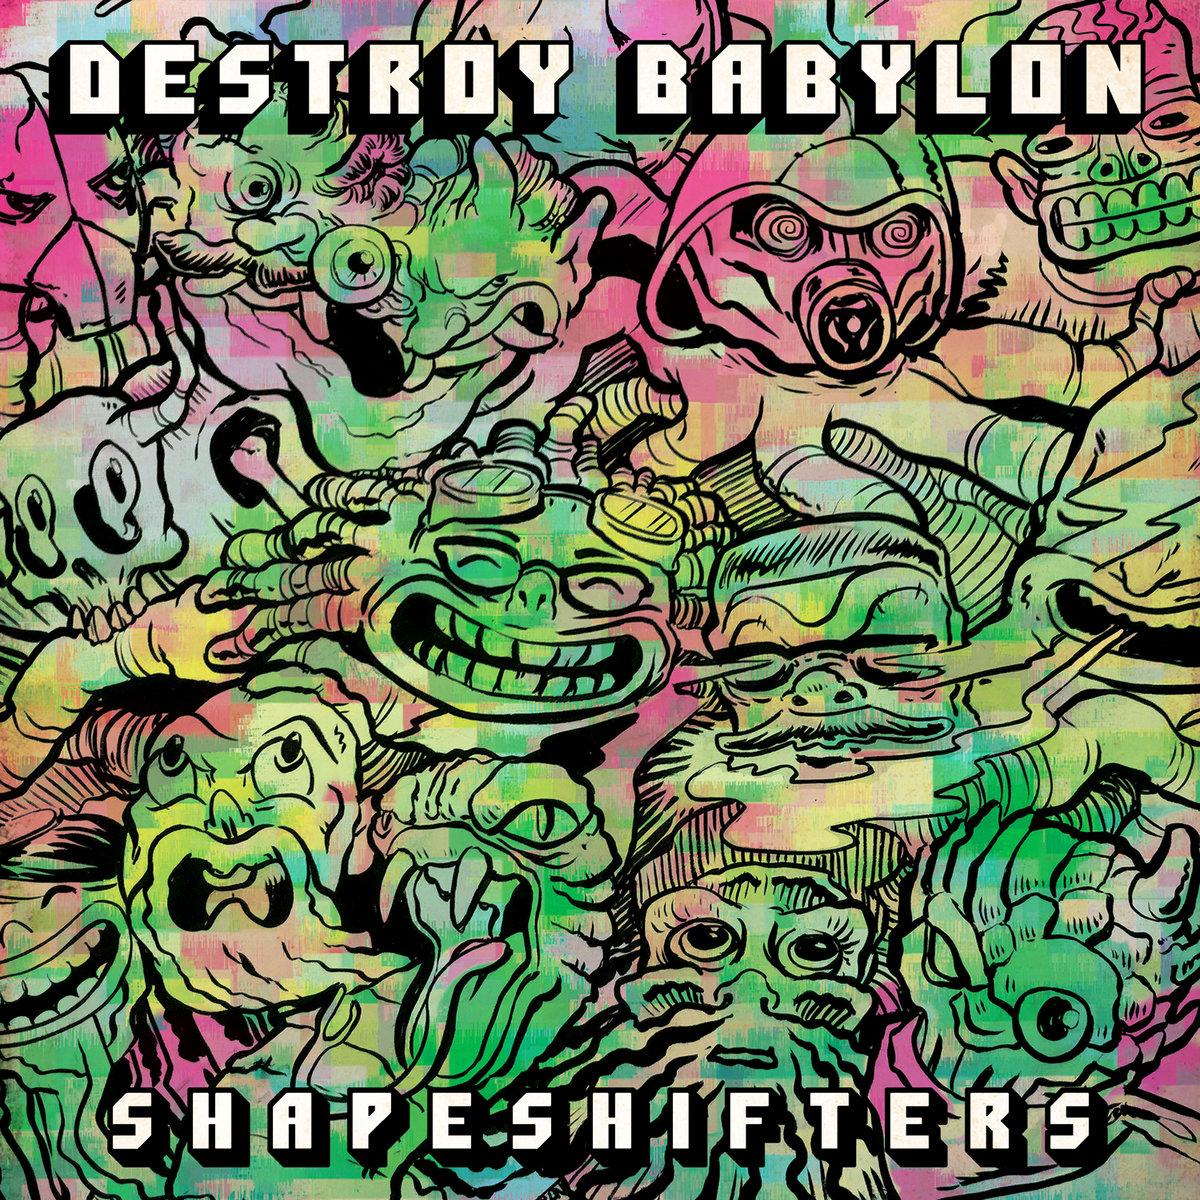 Shapeshifters | Destroy Babylon